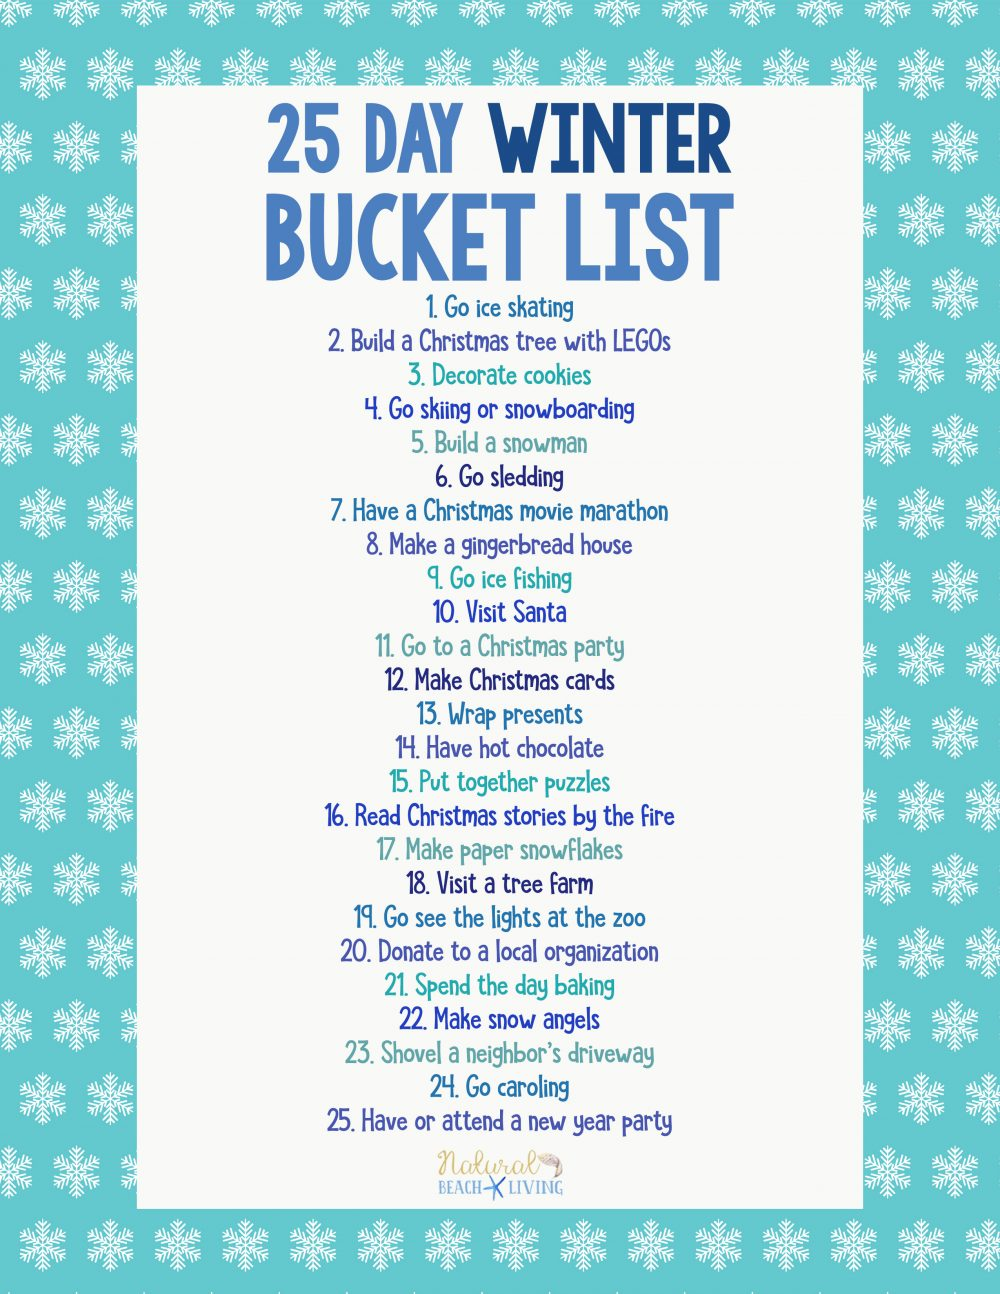 25 Winter Bucket List Ideas for Family Fun